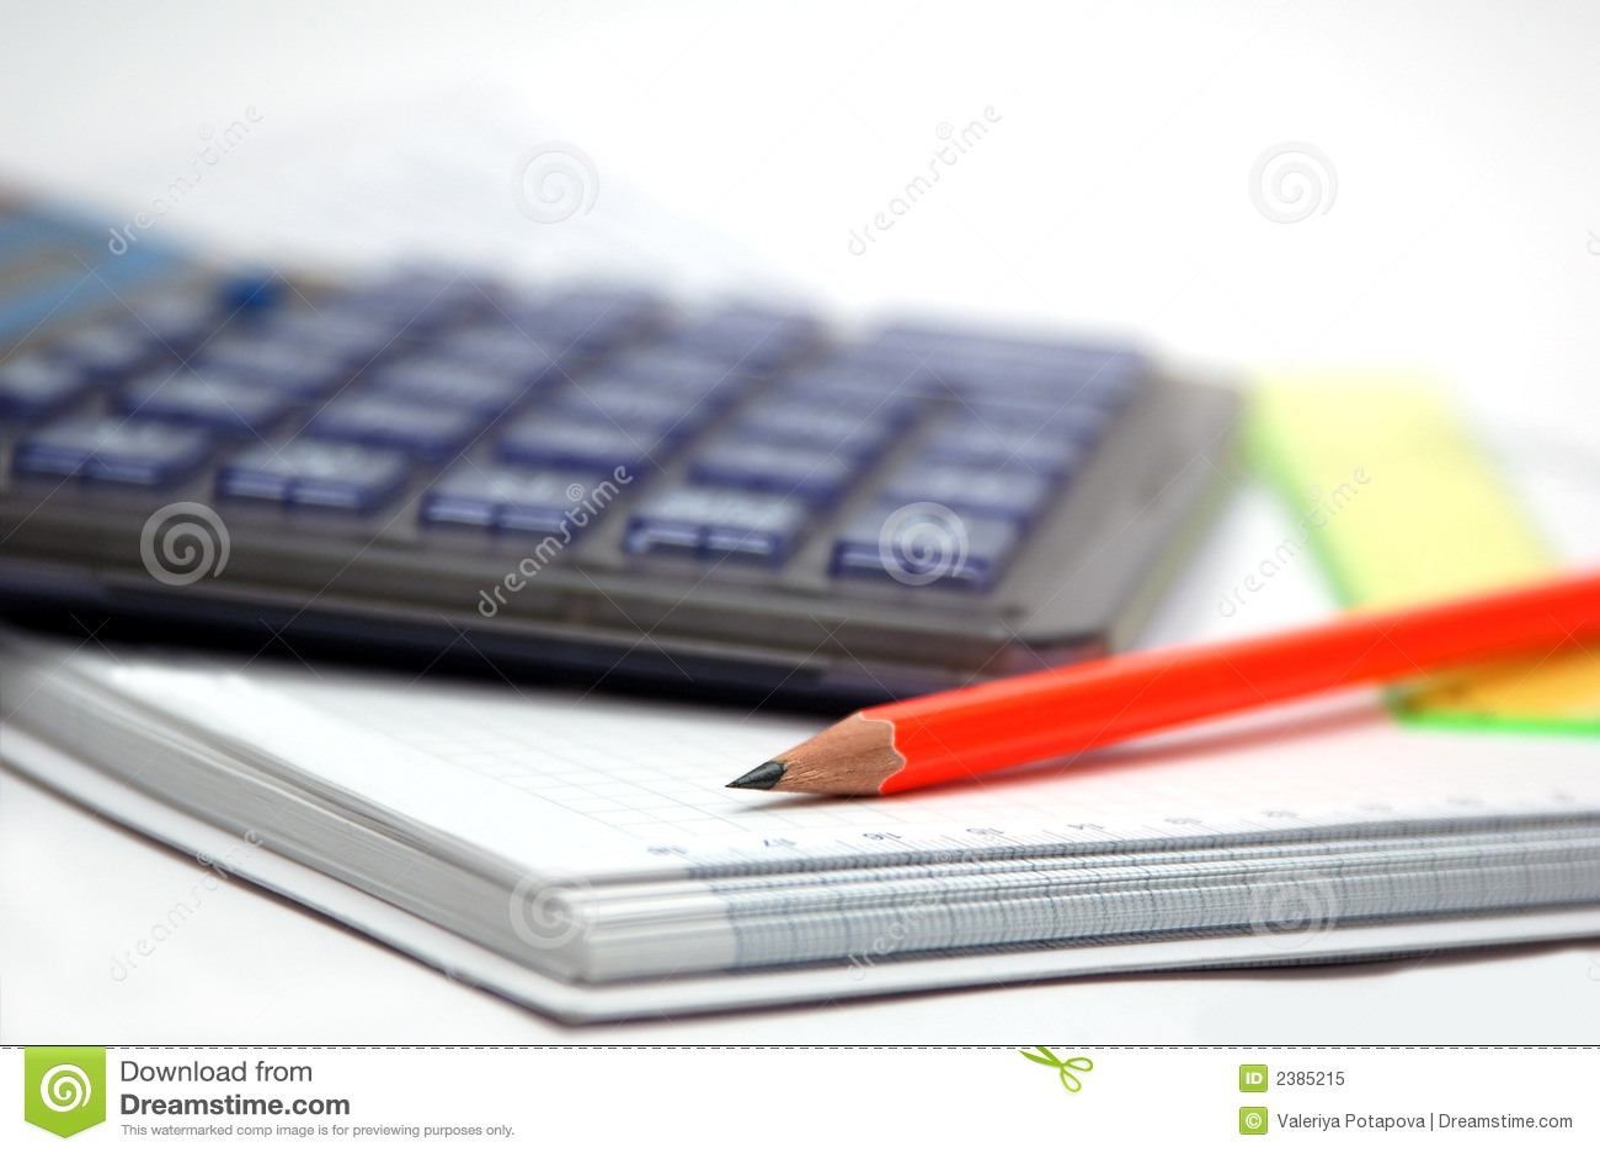 Calculadora e lápis alaranjado